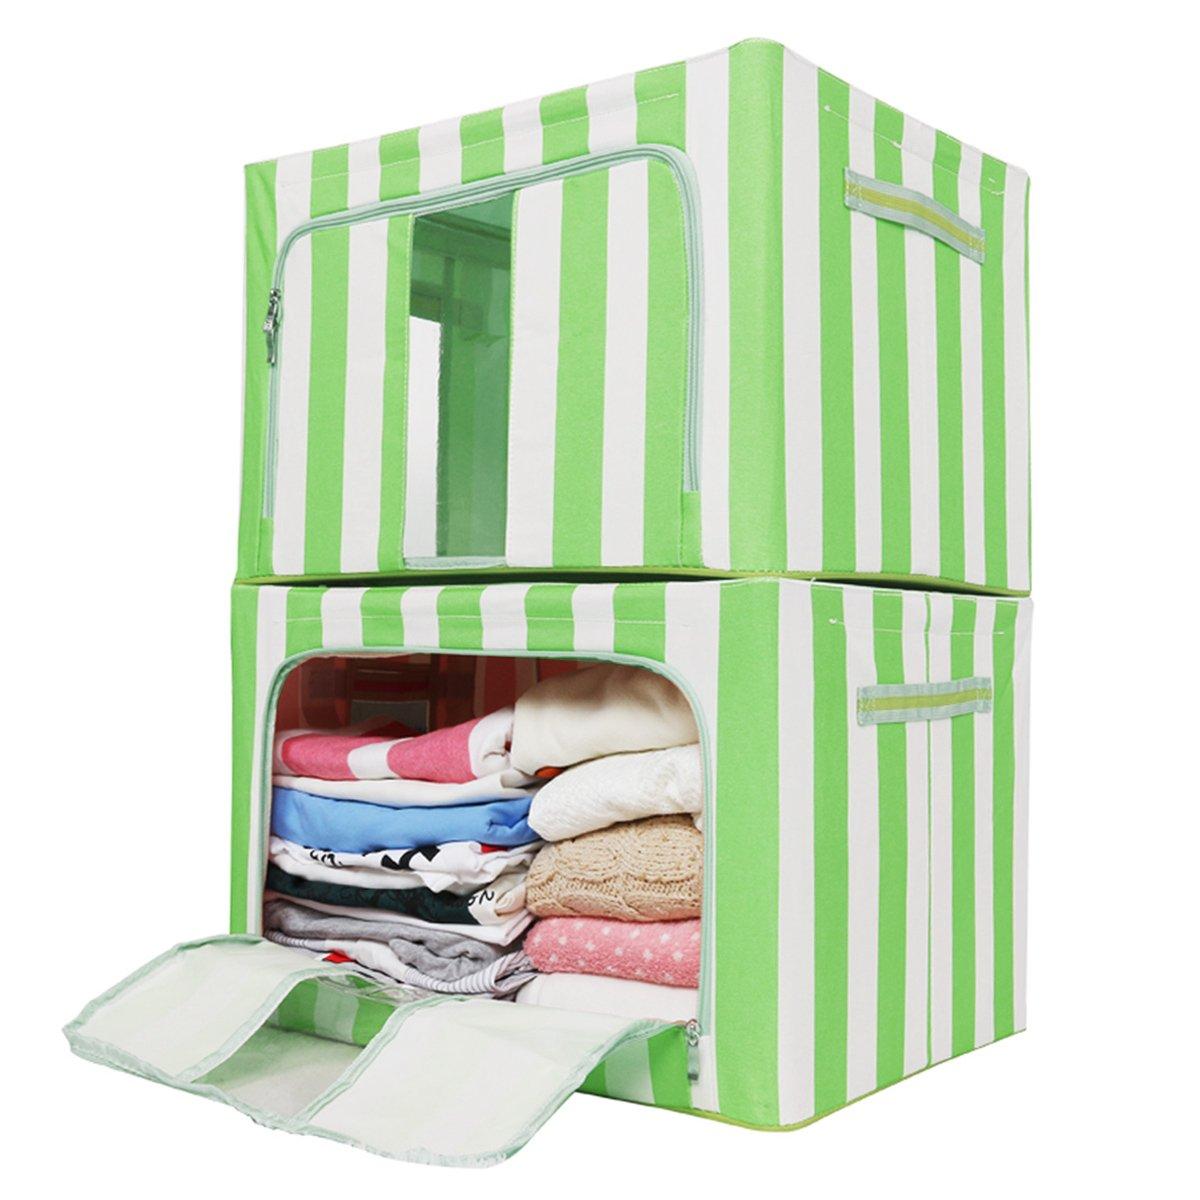 d77fbf92ea Top 10 wholesale Bed Quilts - Chinabrands.com